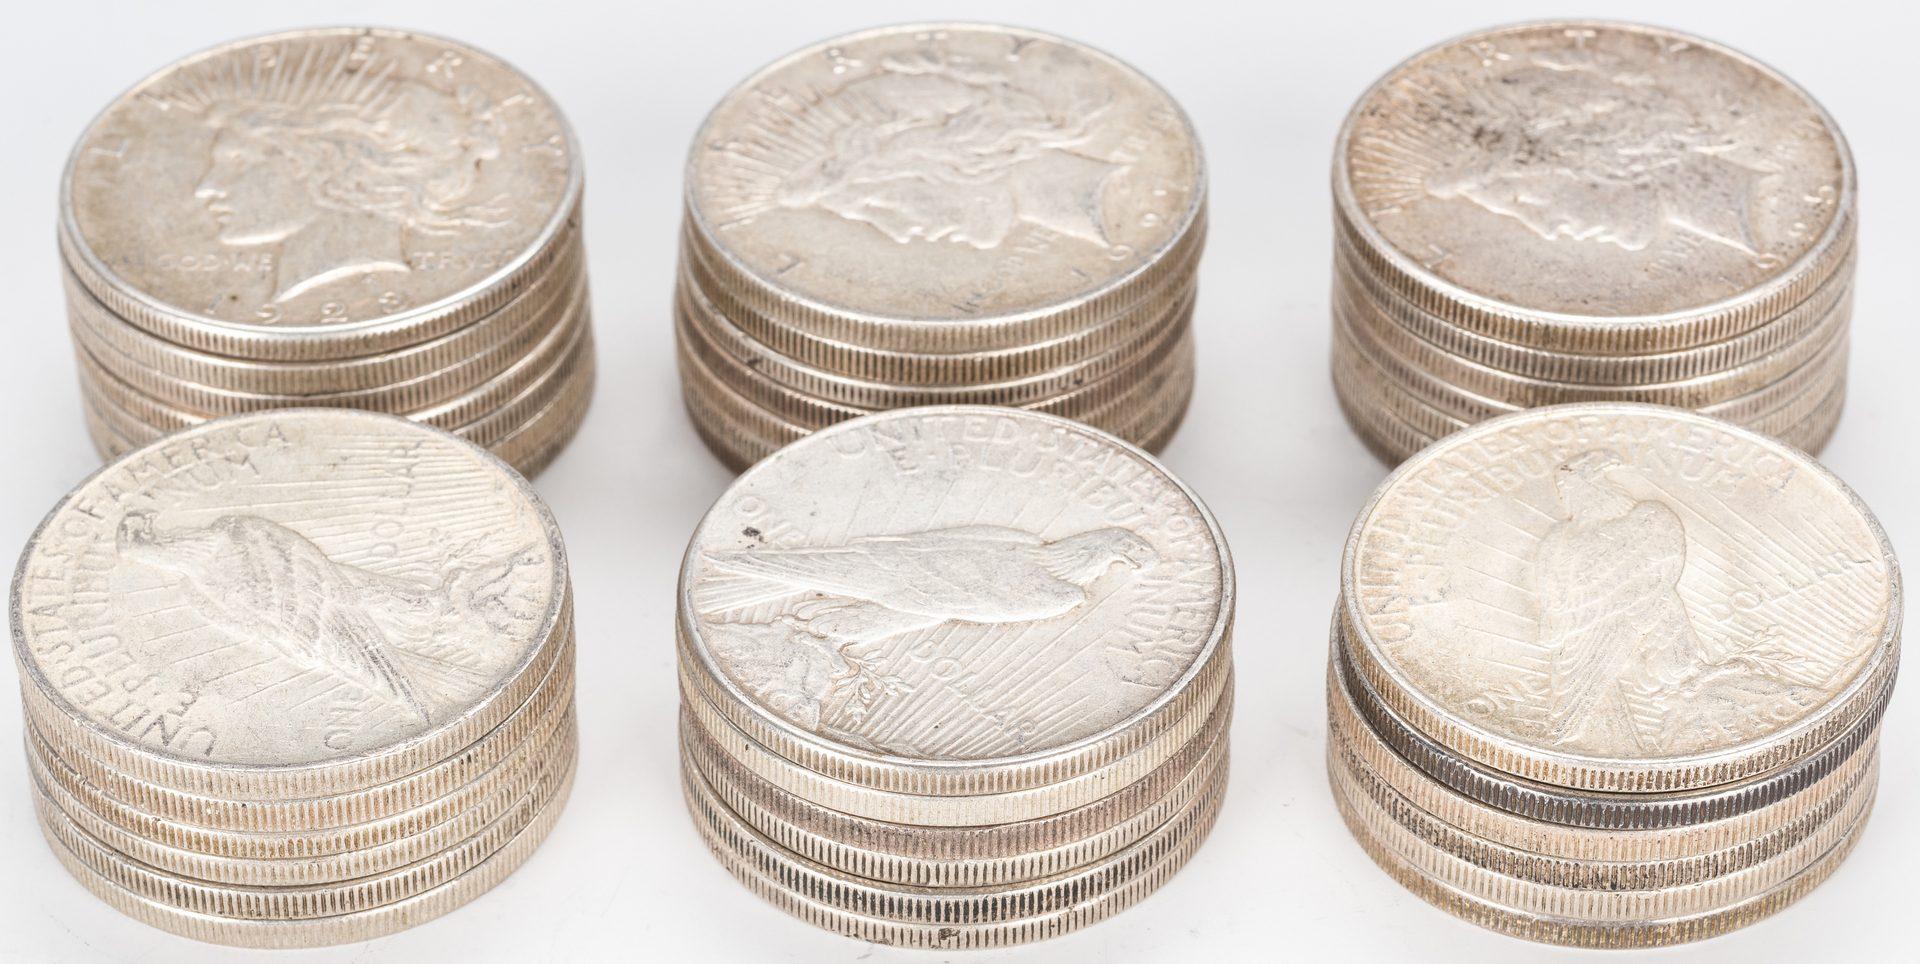 Lot 889: 39 U.S. Peace Silver Dollars (1922-1935)